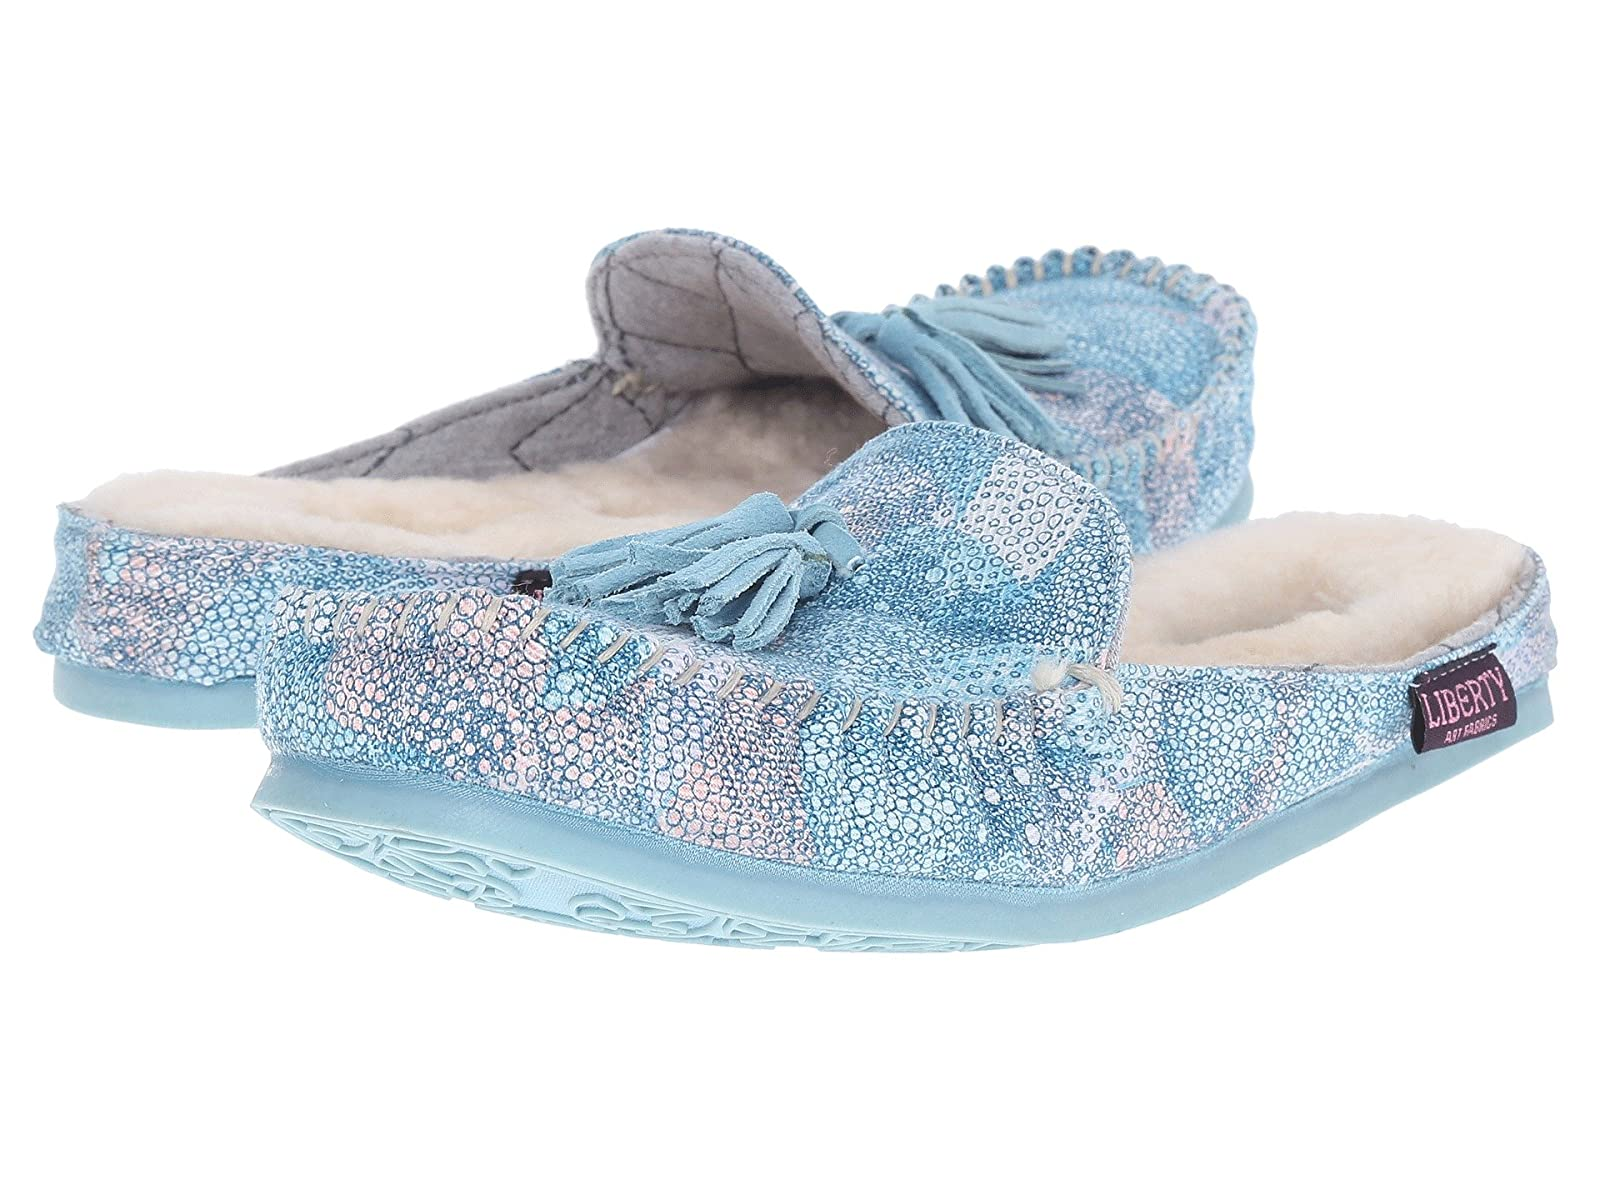 Bedroom Athletics GeorginaCheap and distinctive eye-catching shoes